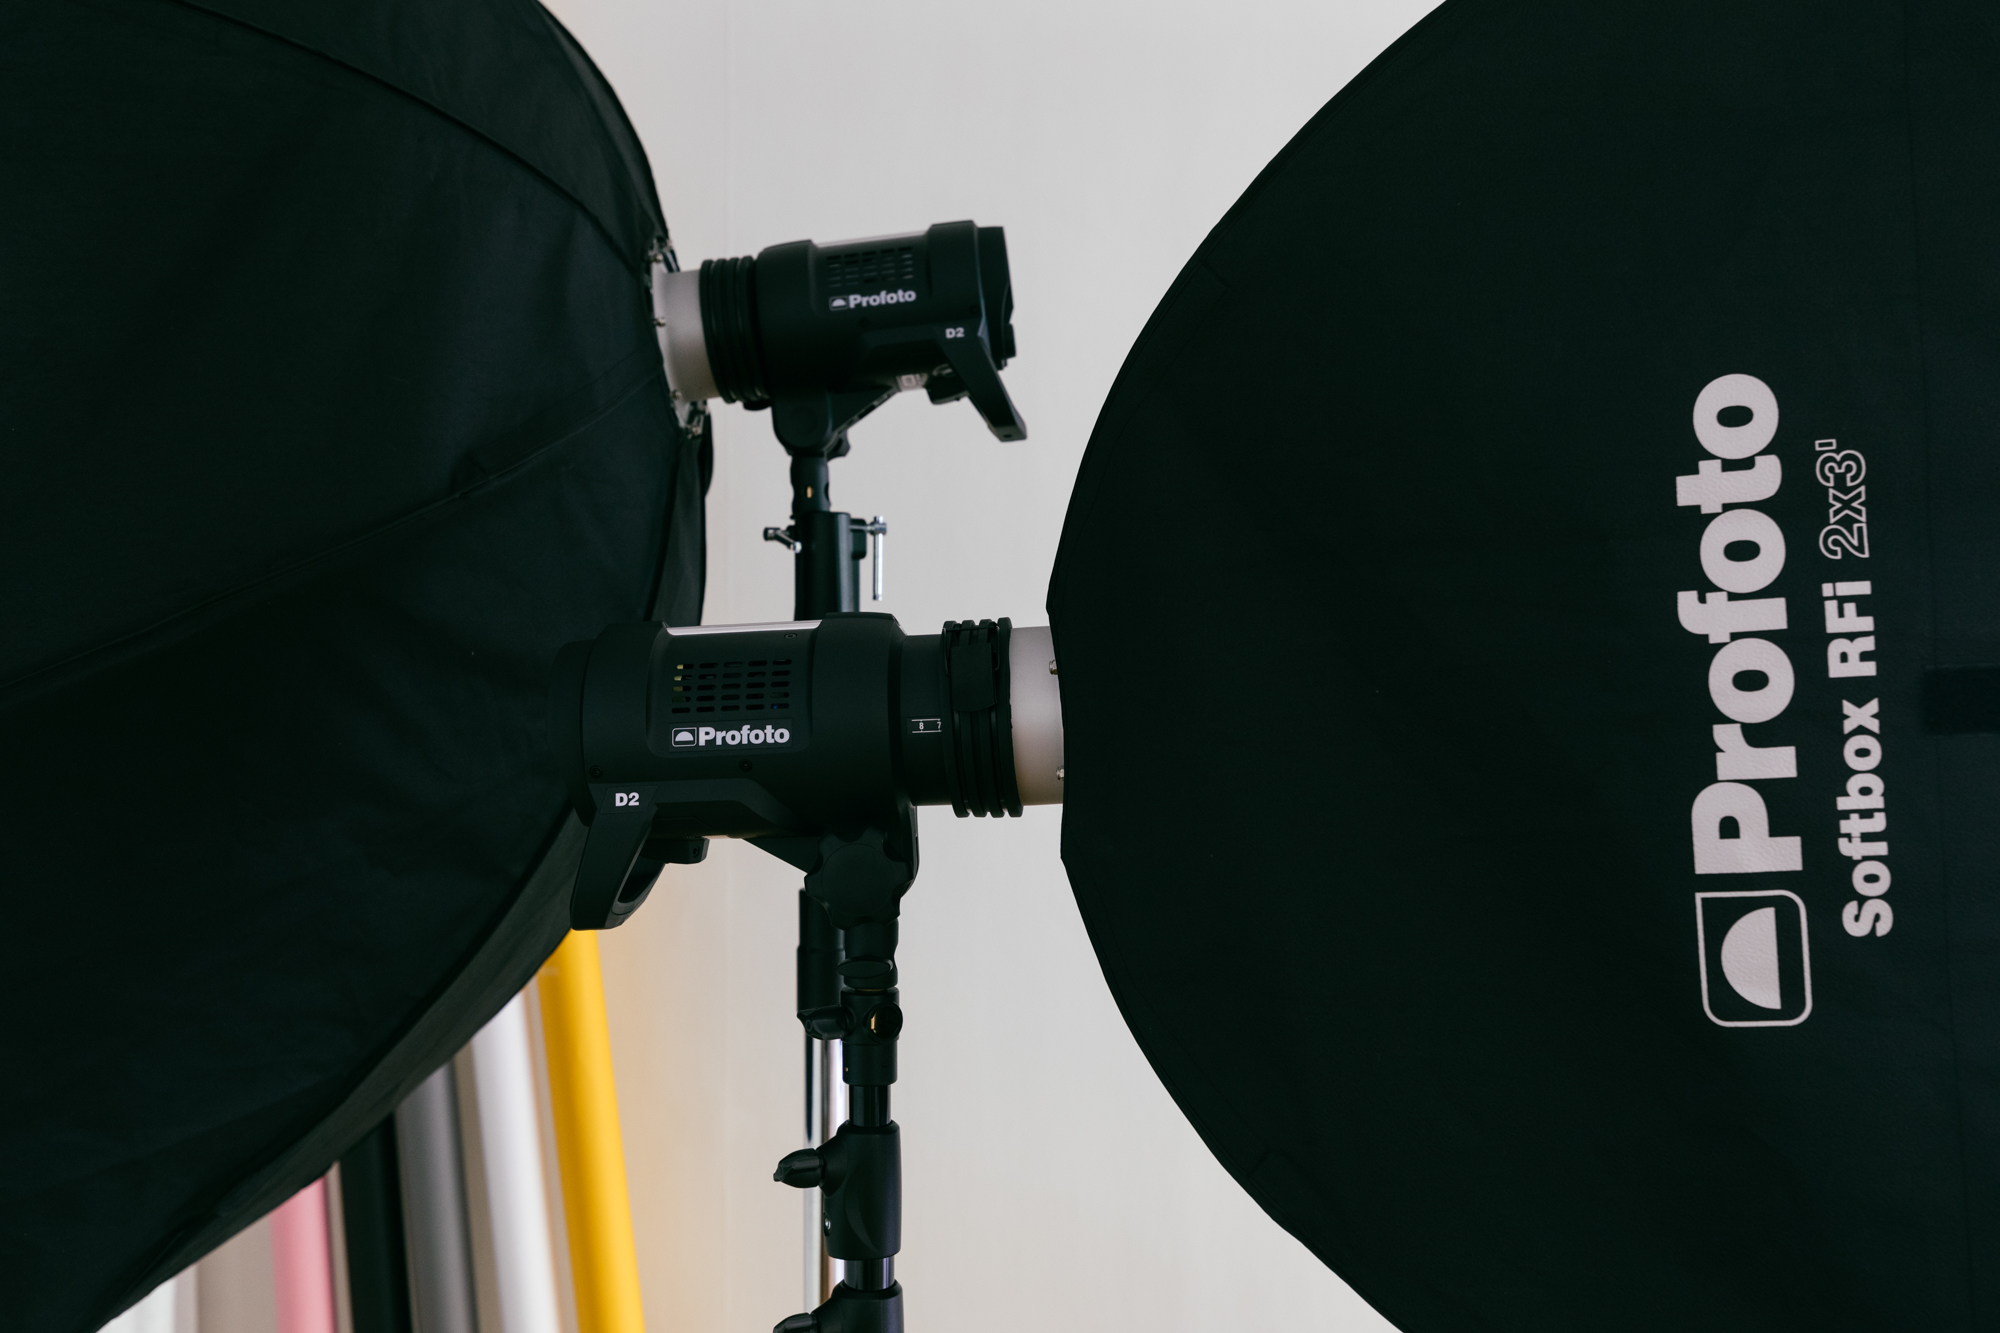 Profoto D2 lights and softbox • Photography Studio for rent • workshop ten • Hong Kong